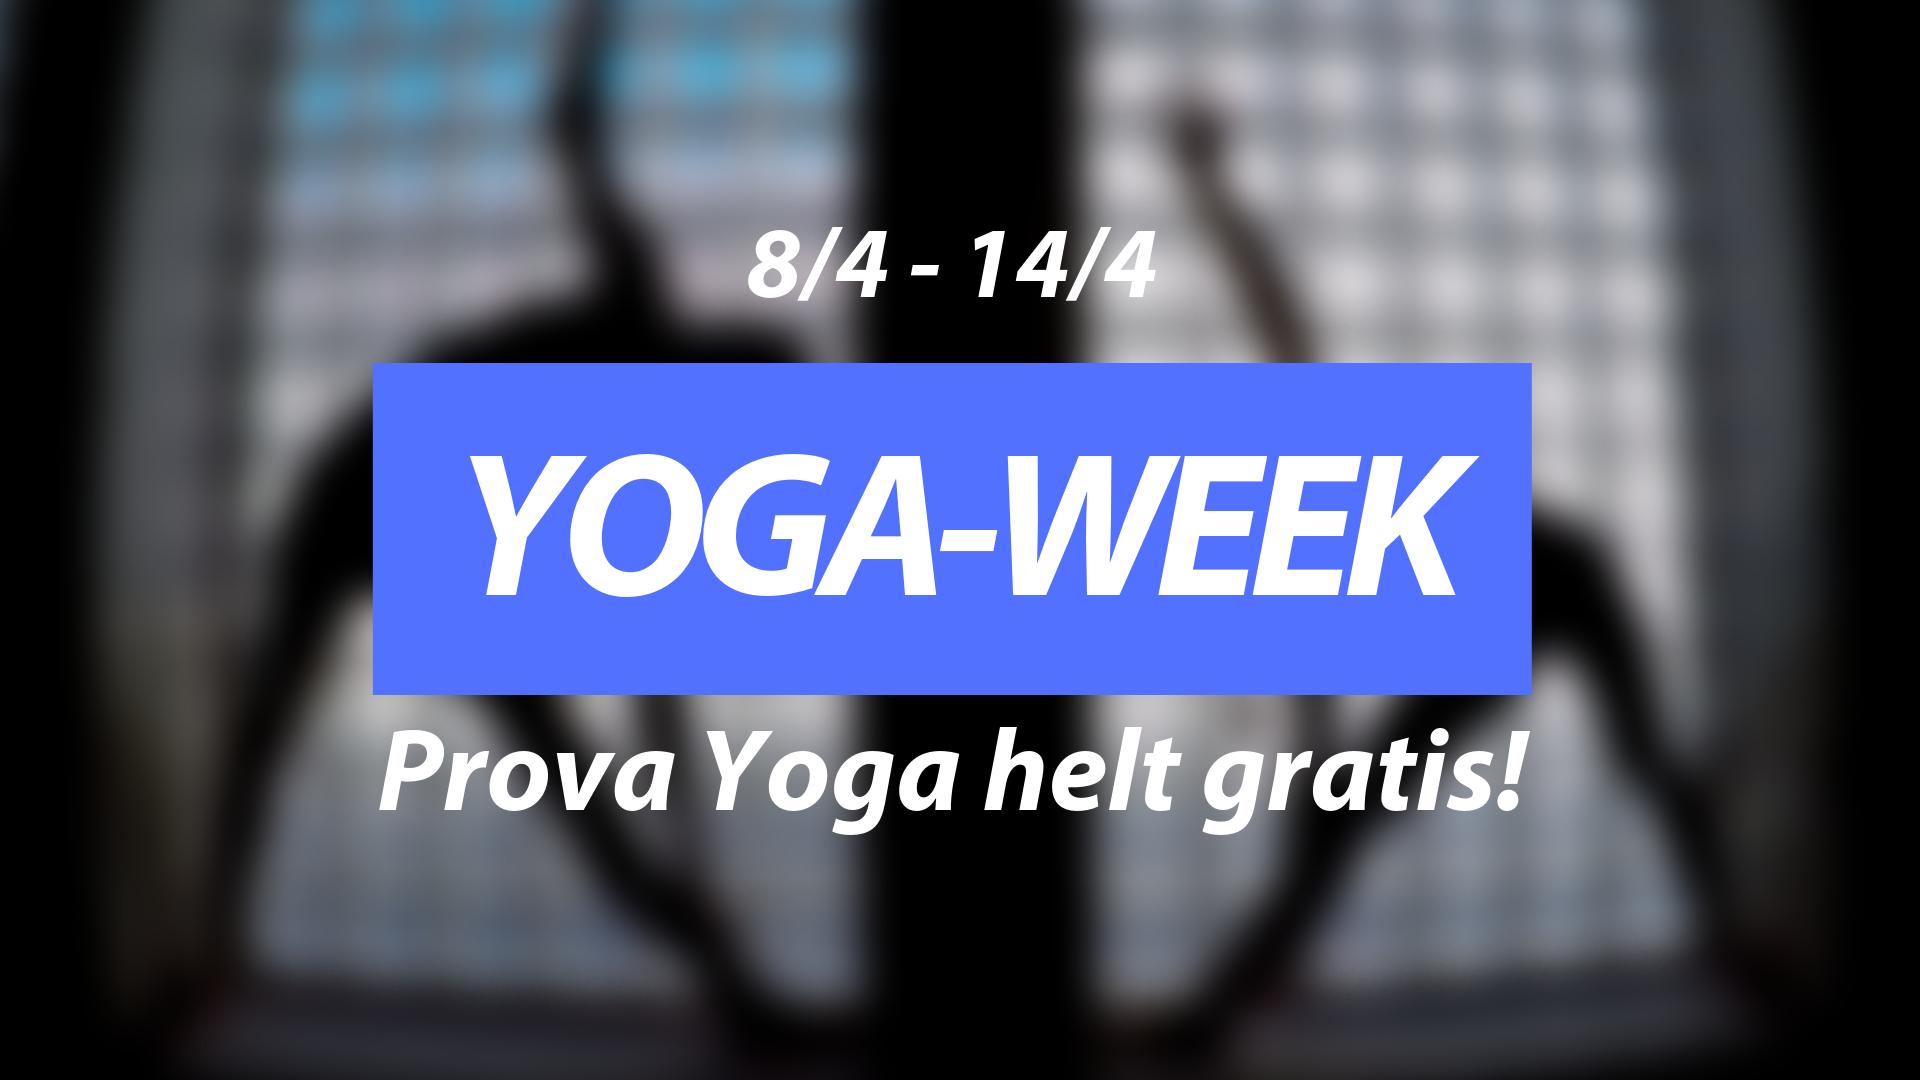 YOGA-WEEK 8/4 – 14/4